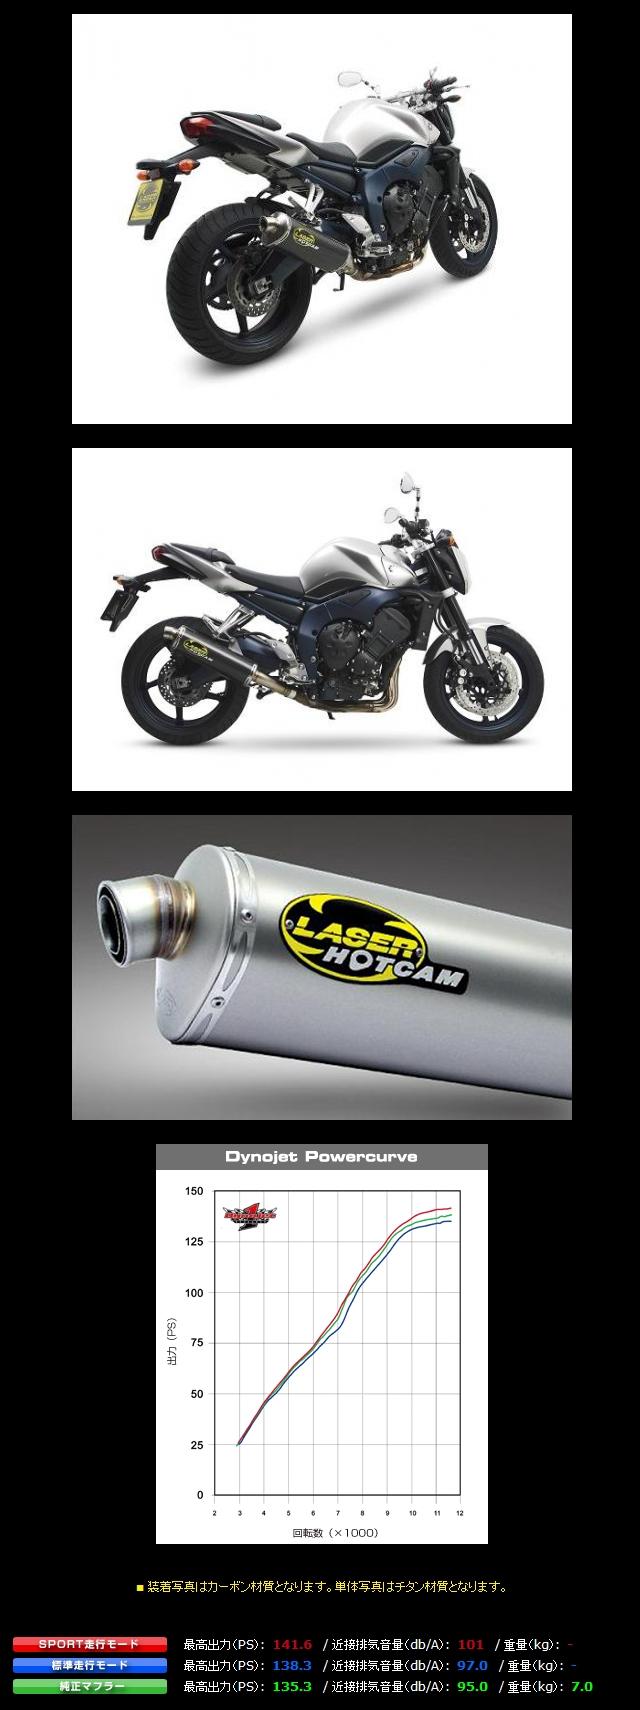 【LASER】Hot Cam DS 排氣管尾段  - 「Webike-摩托百貨」